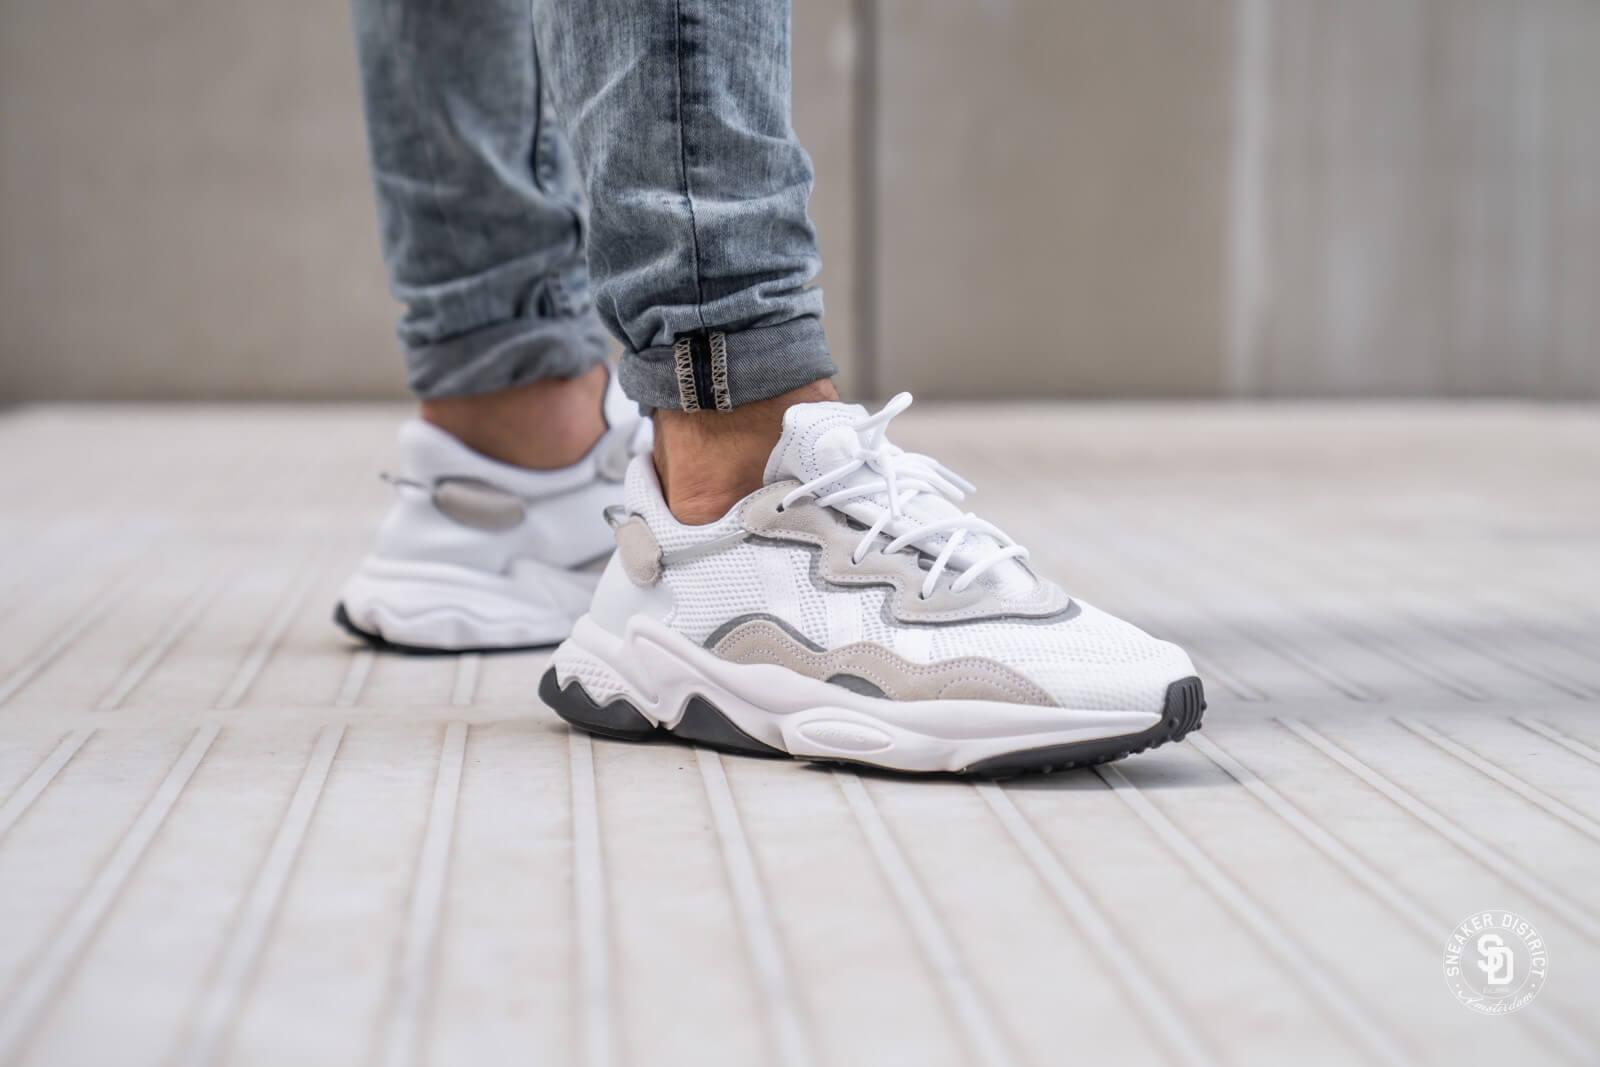 Adidas Ozweego Footwear White/Core Black - EE6464